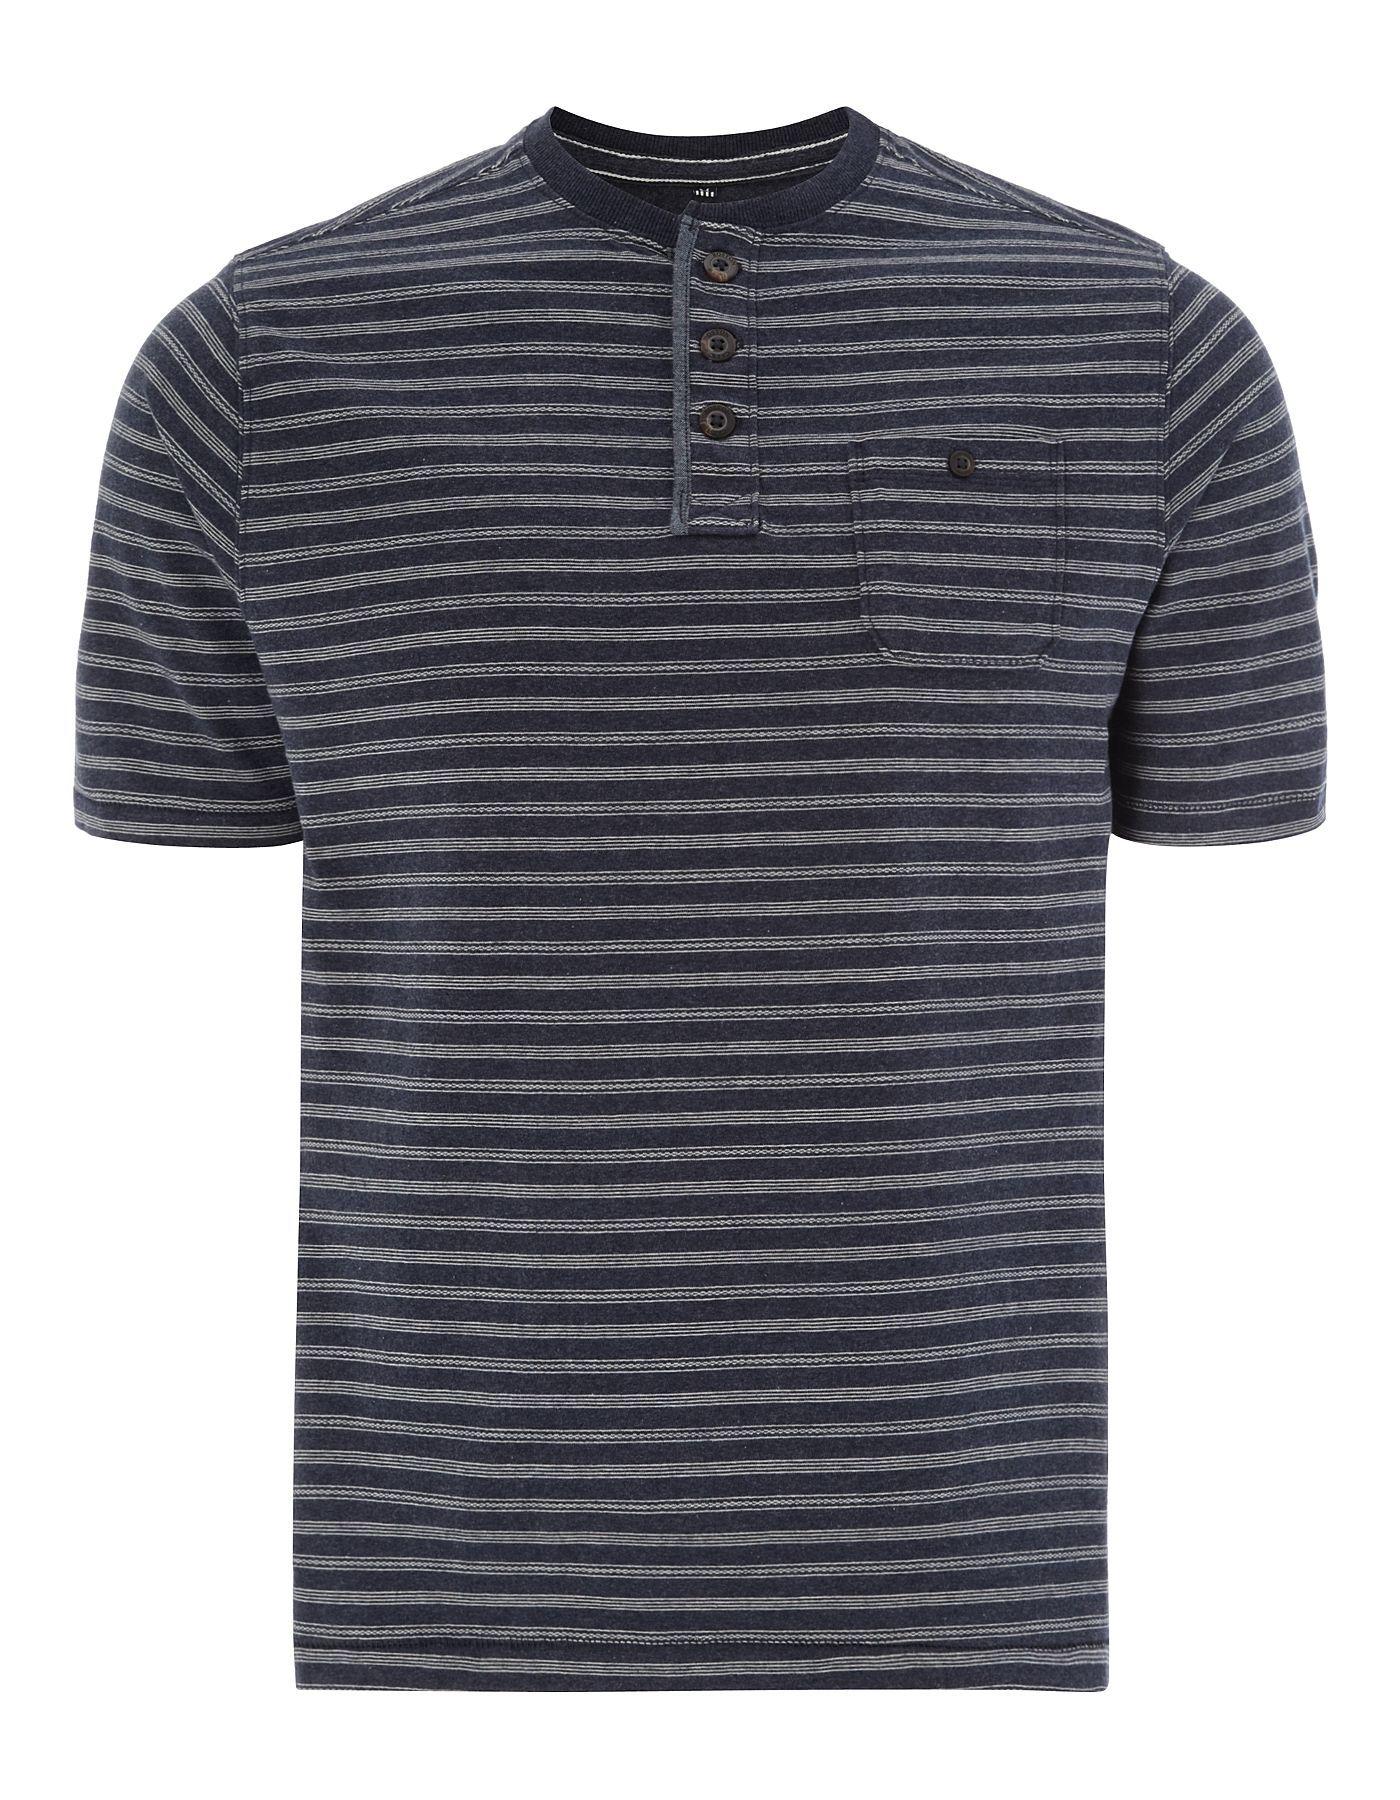 Black t shirt asda - Boston Crew Stripe T Shirt Men George At Asda